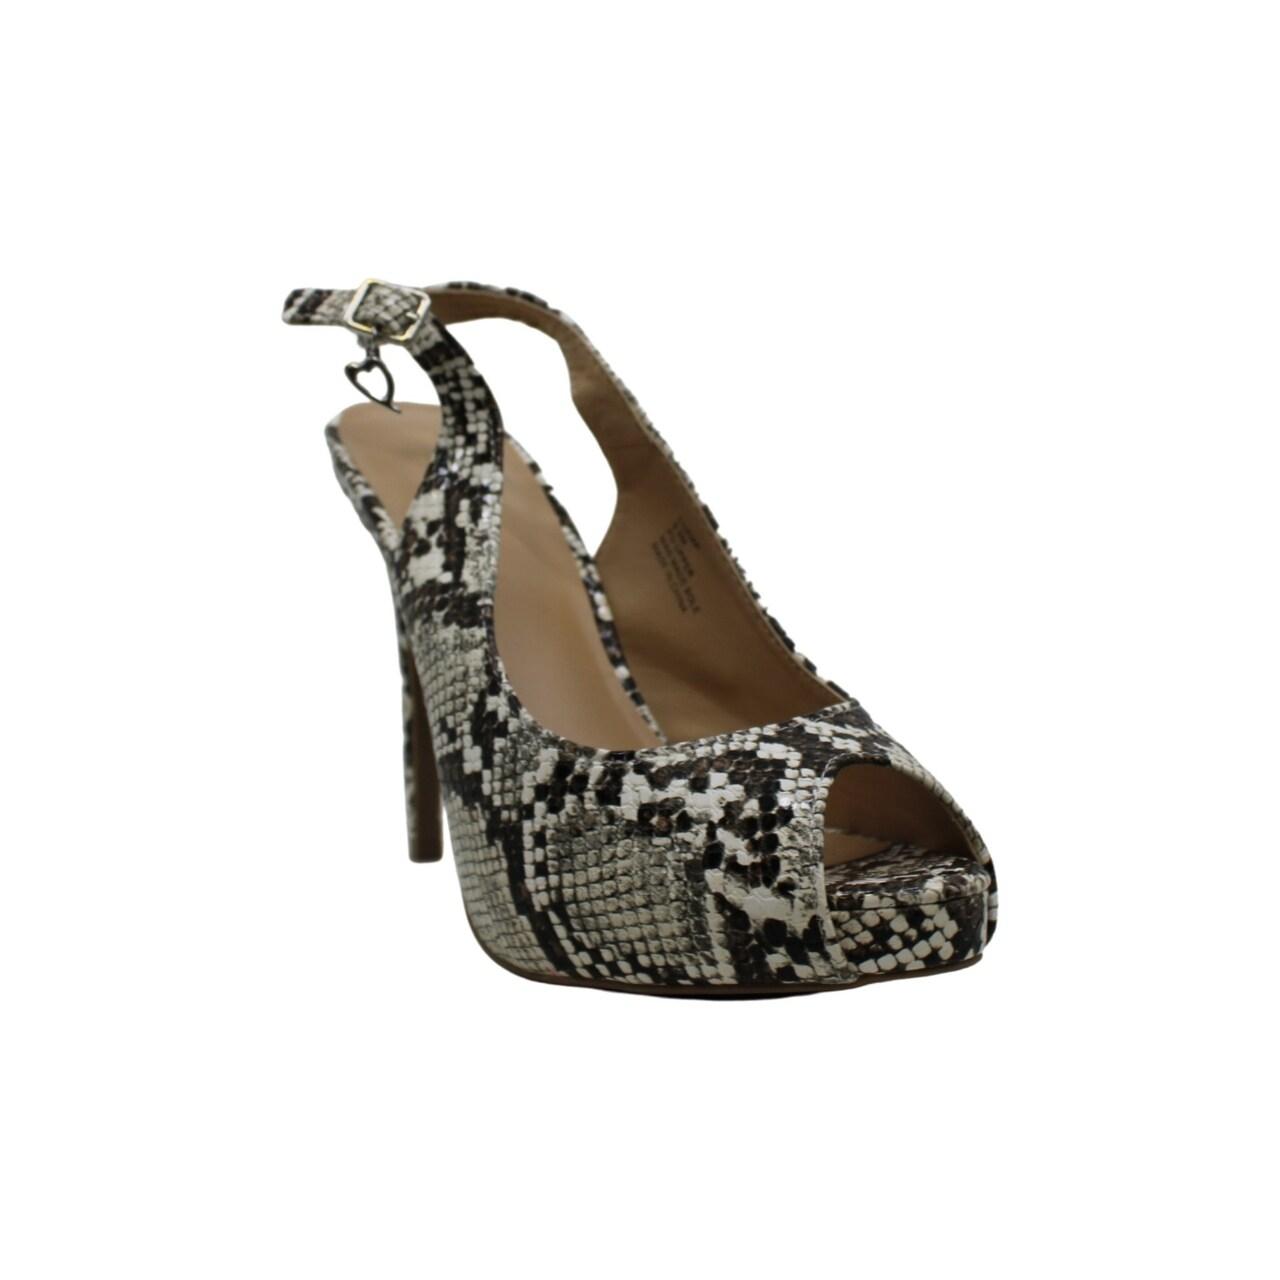 Thalia Sodi Womens Luzia Slingbacks Stiletto Peep-Toe Heels Shoes BHFO 0987